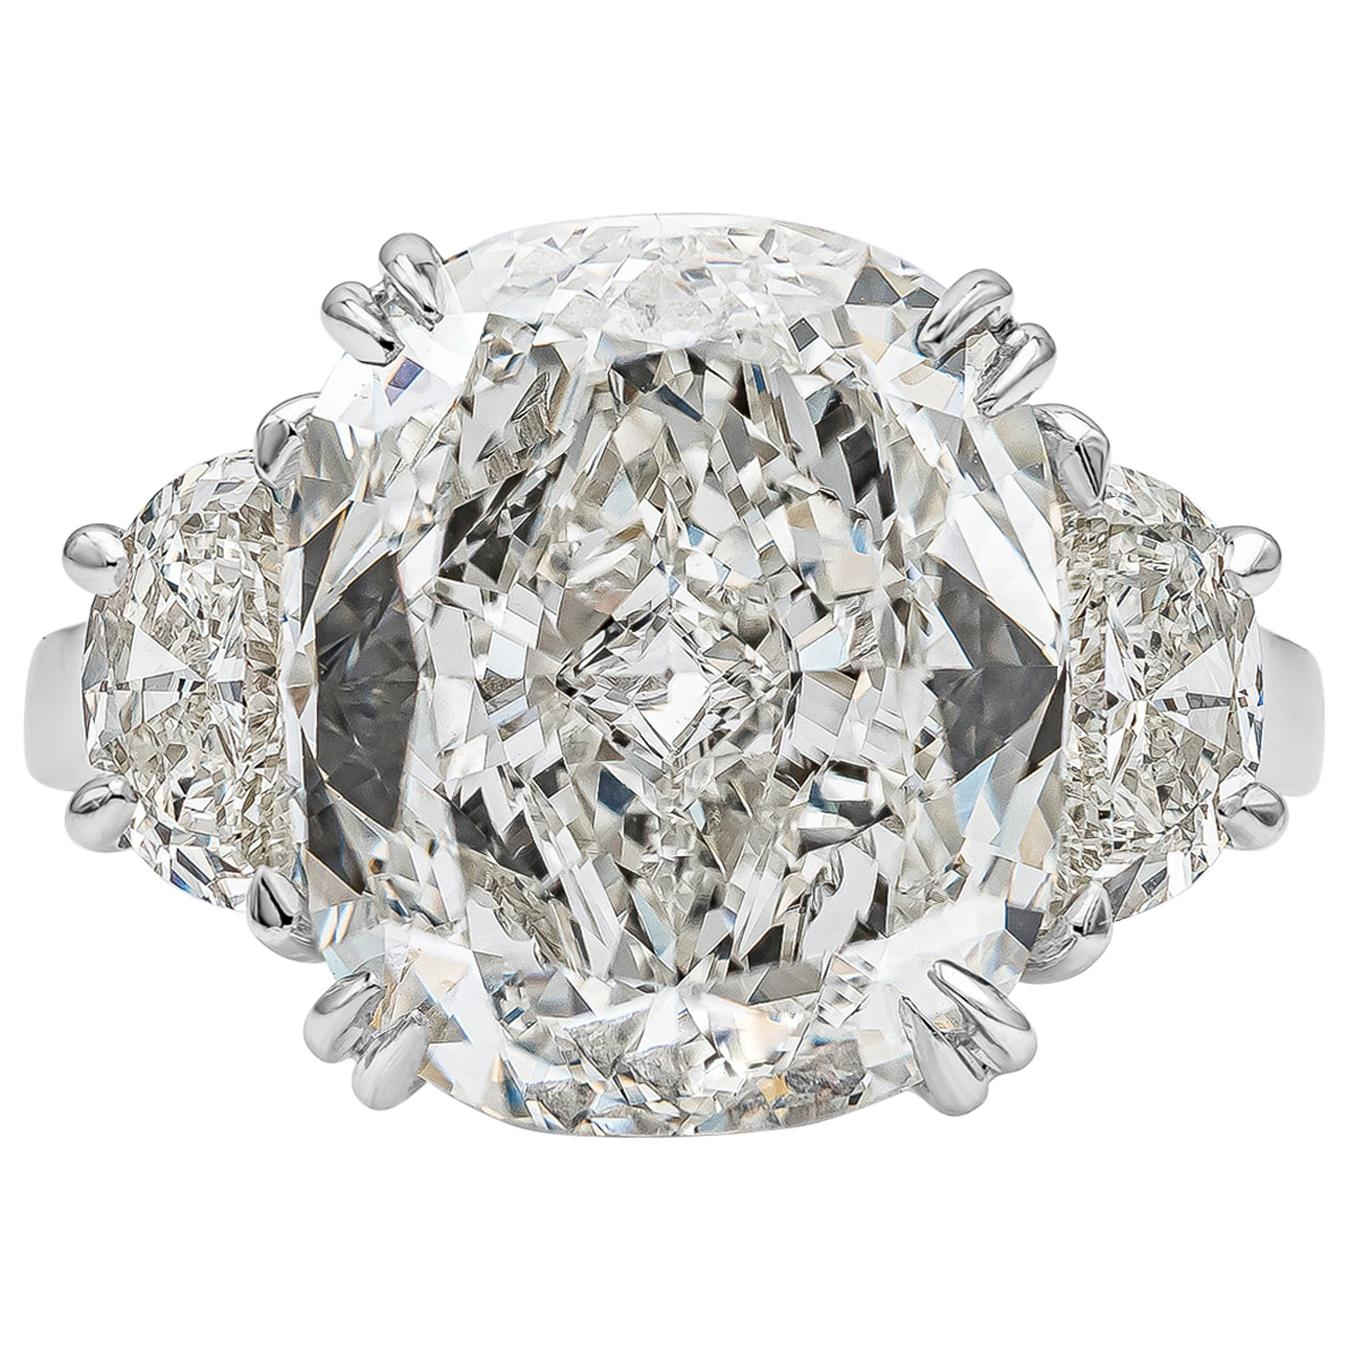 GIA Certified 10.02 Carat Cushion Cut Diamond Three-Stone Engagement Ring